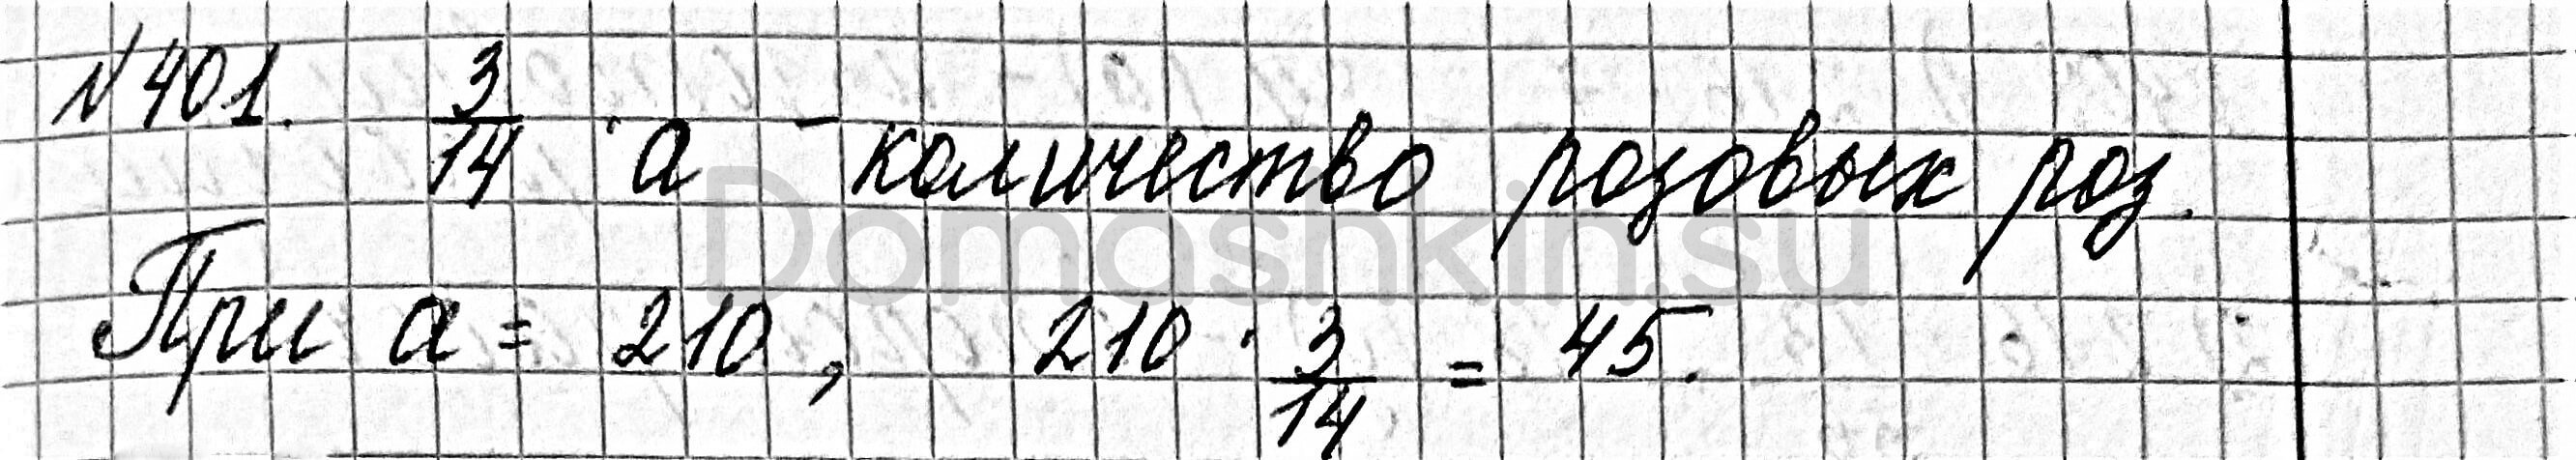 Математика 6 класс учебник Мерзляк номер 401 решение